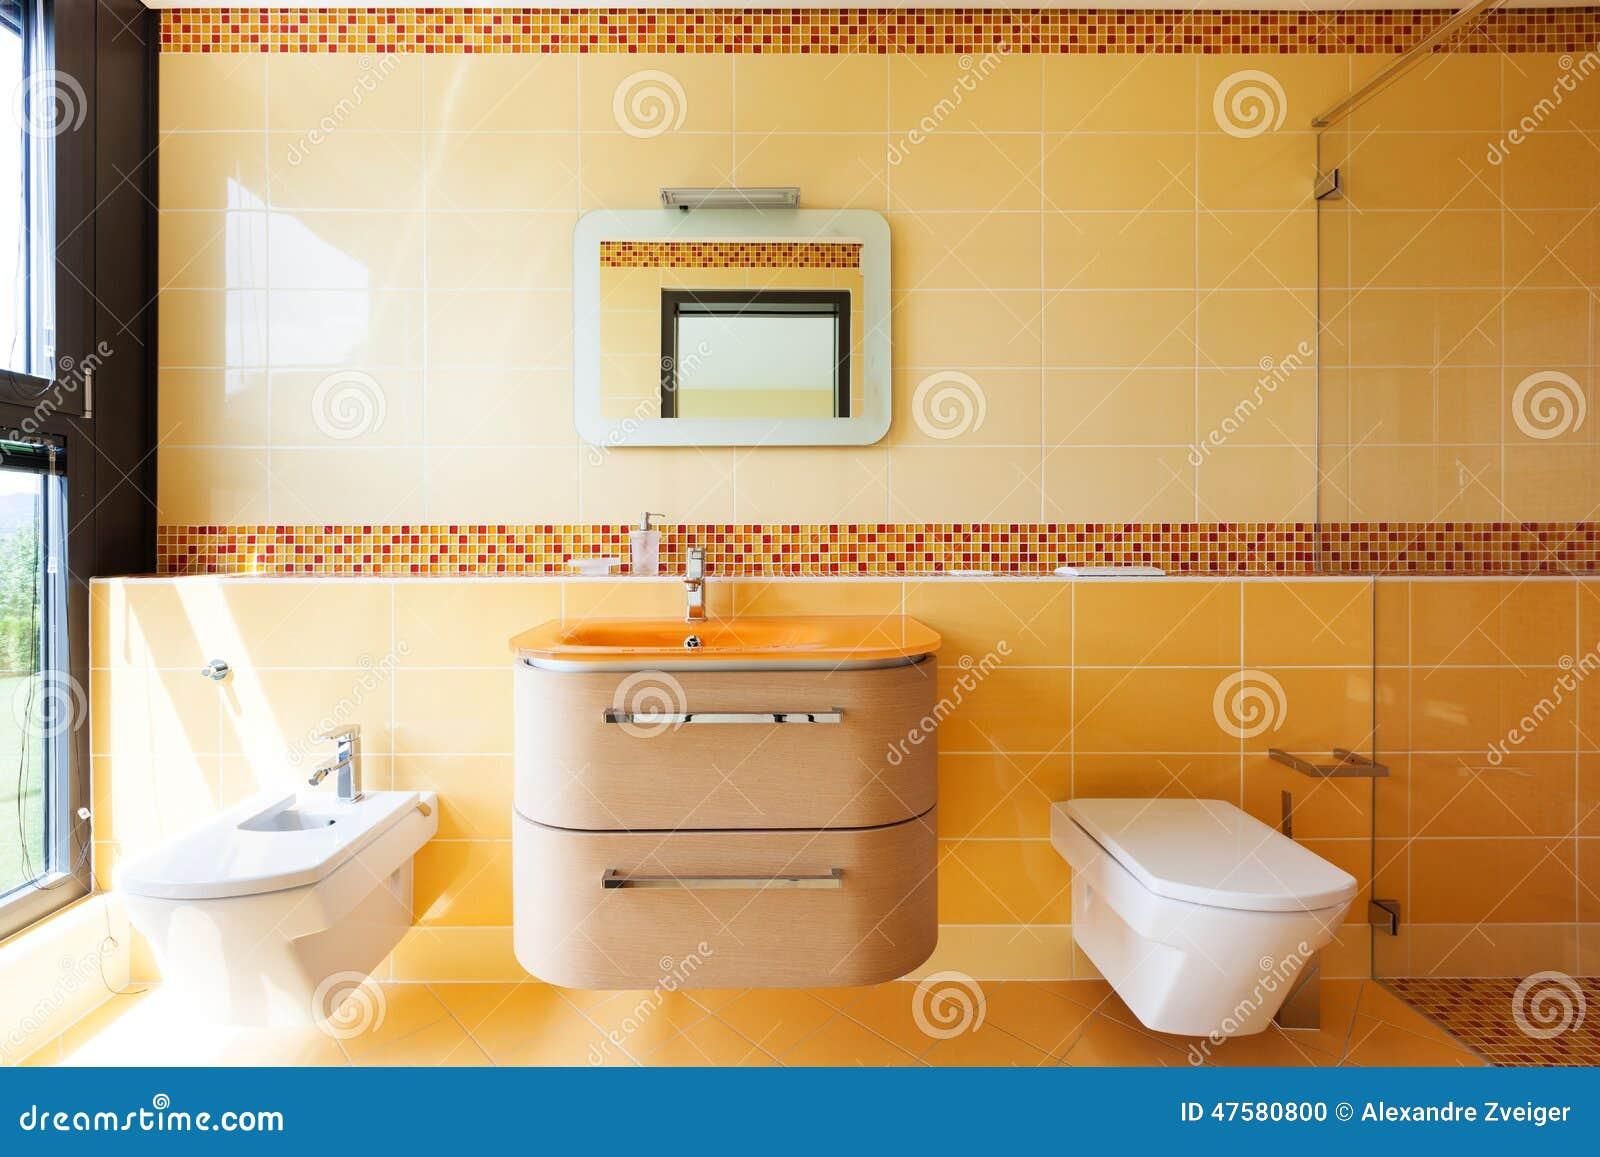 beautiful orange bathroom stock photo - image: 47580800